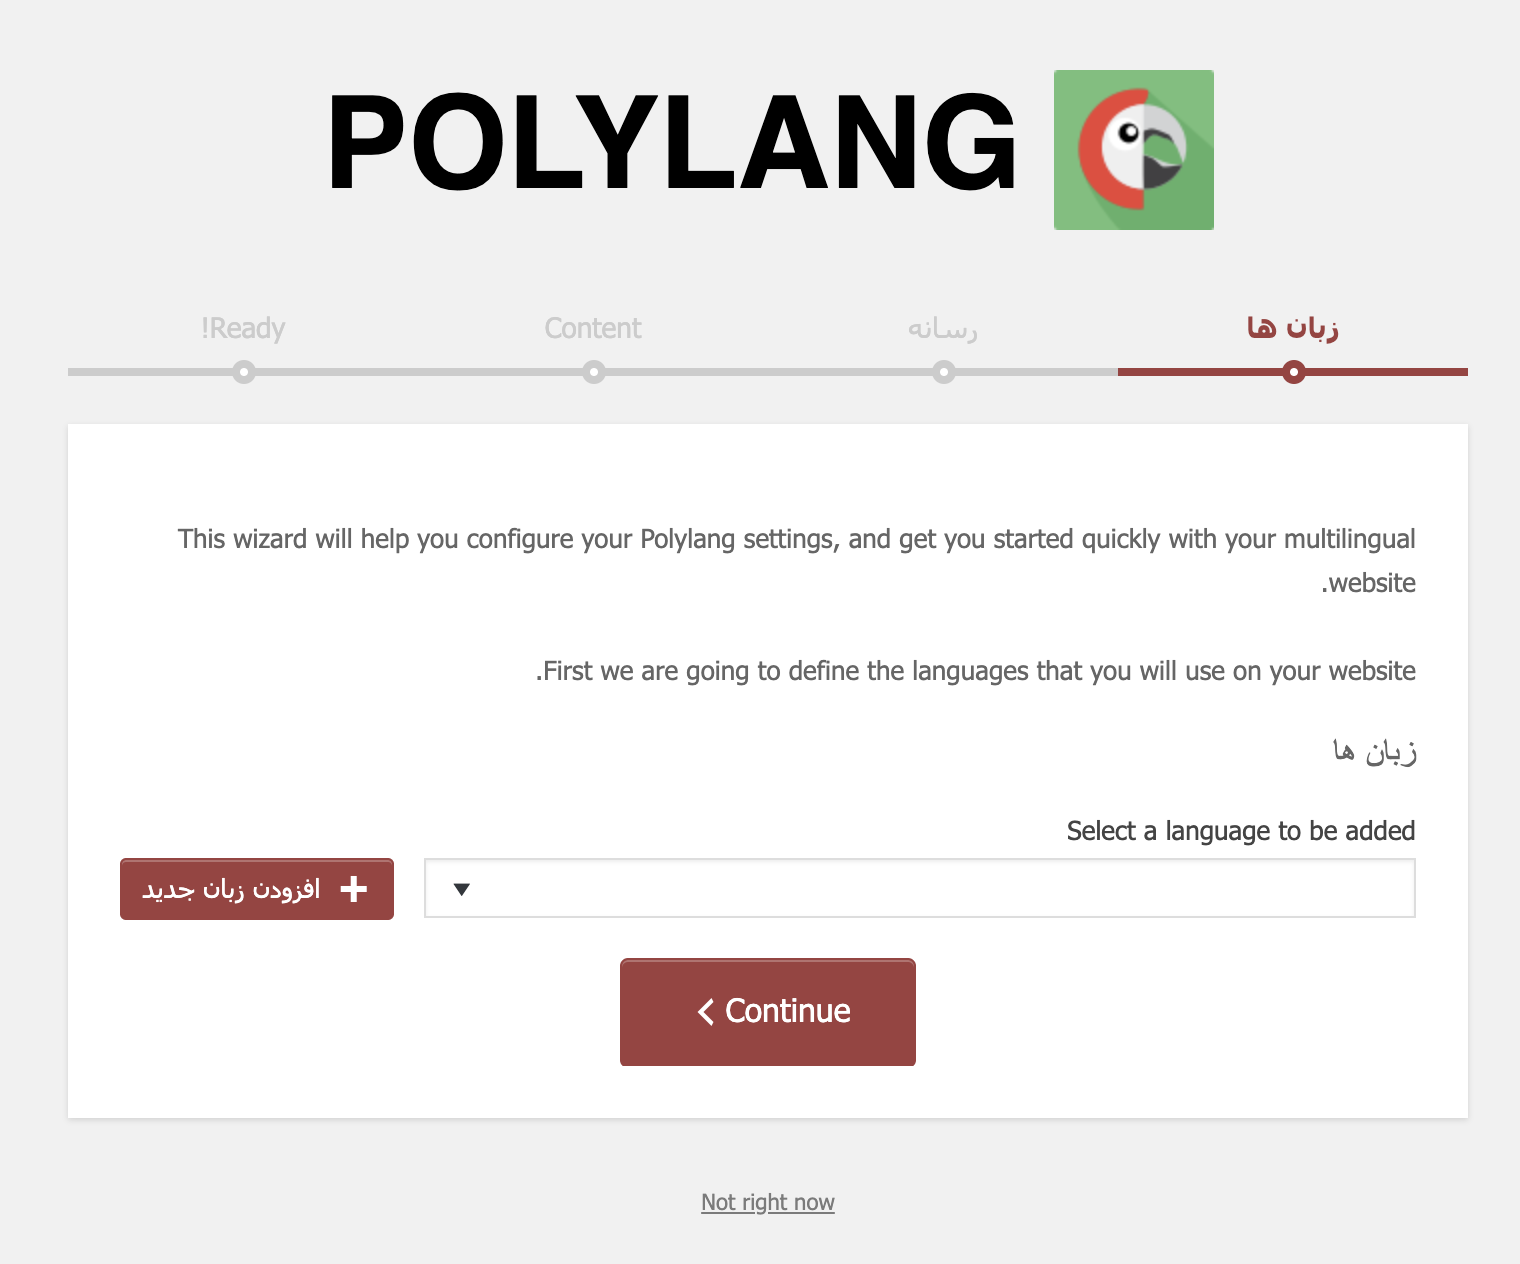 نصب افزونه polylang